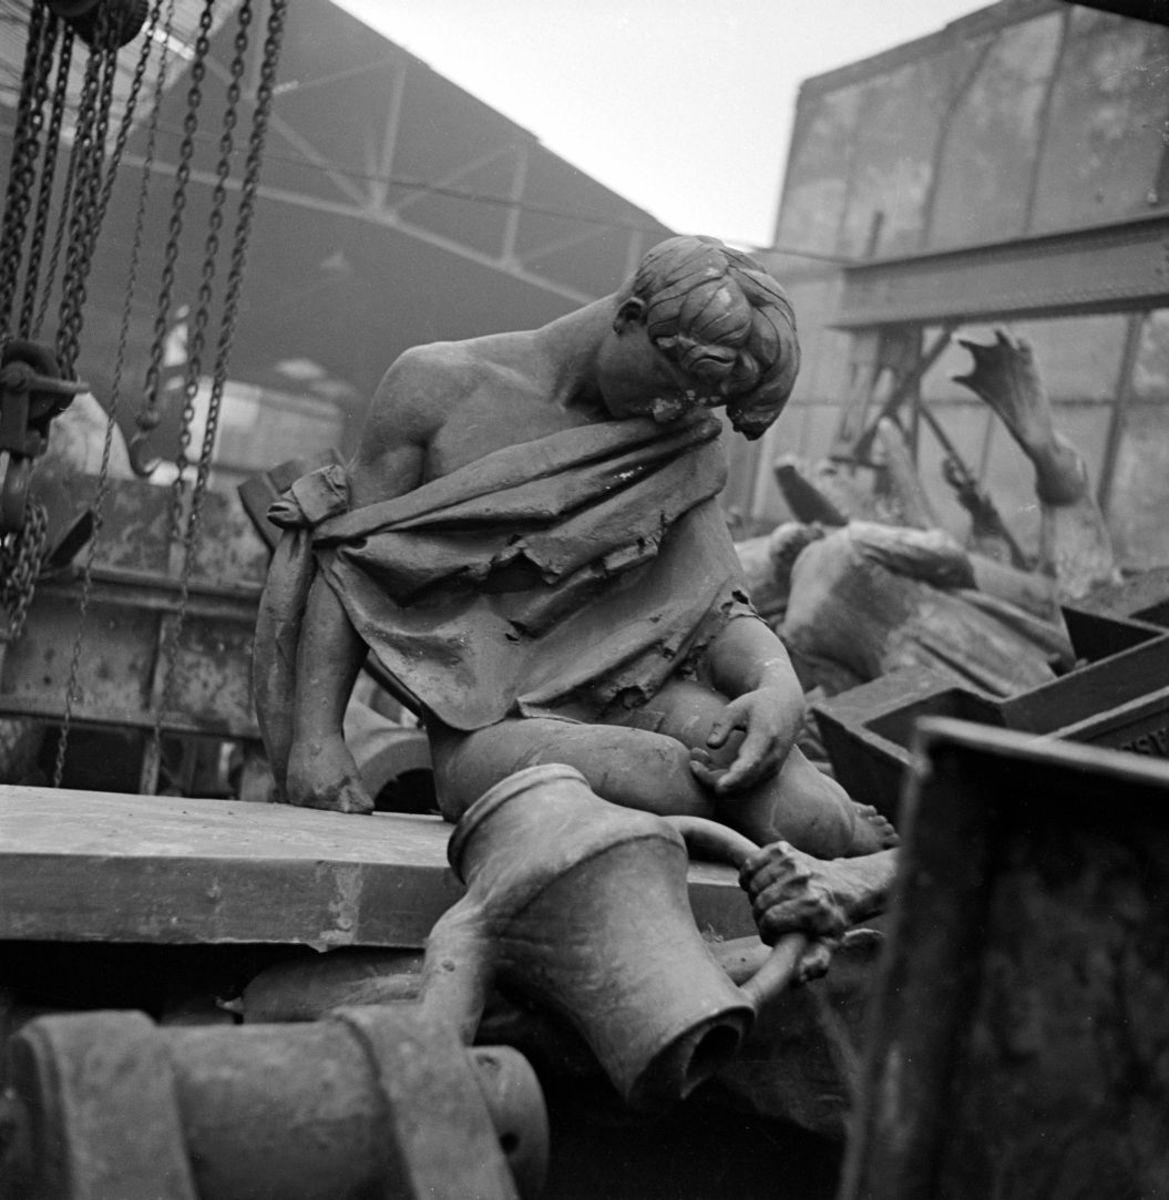 Monuments Detroyed